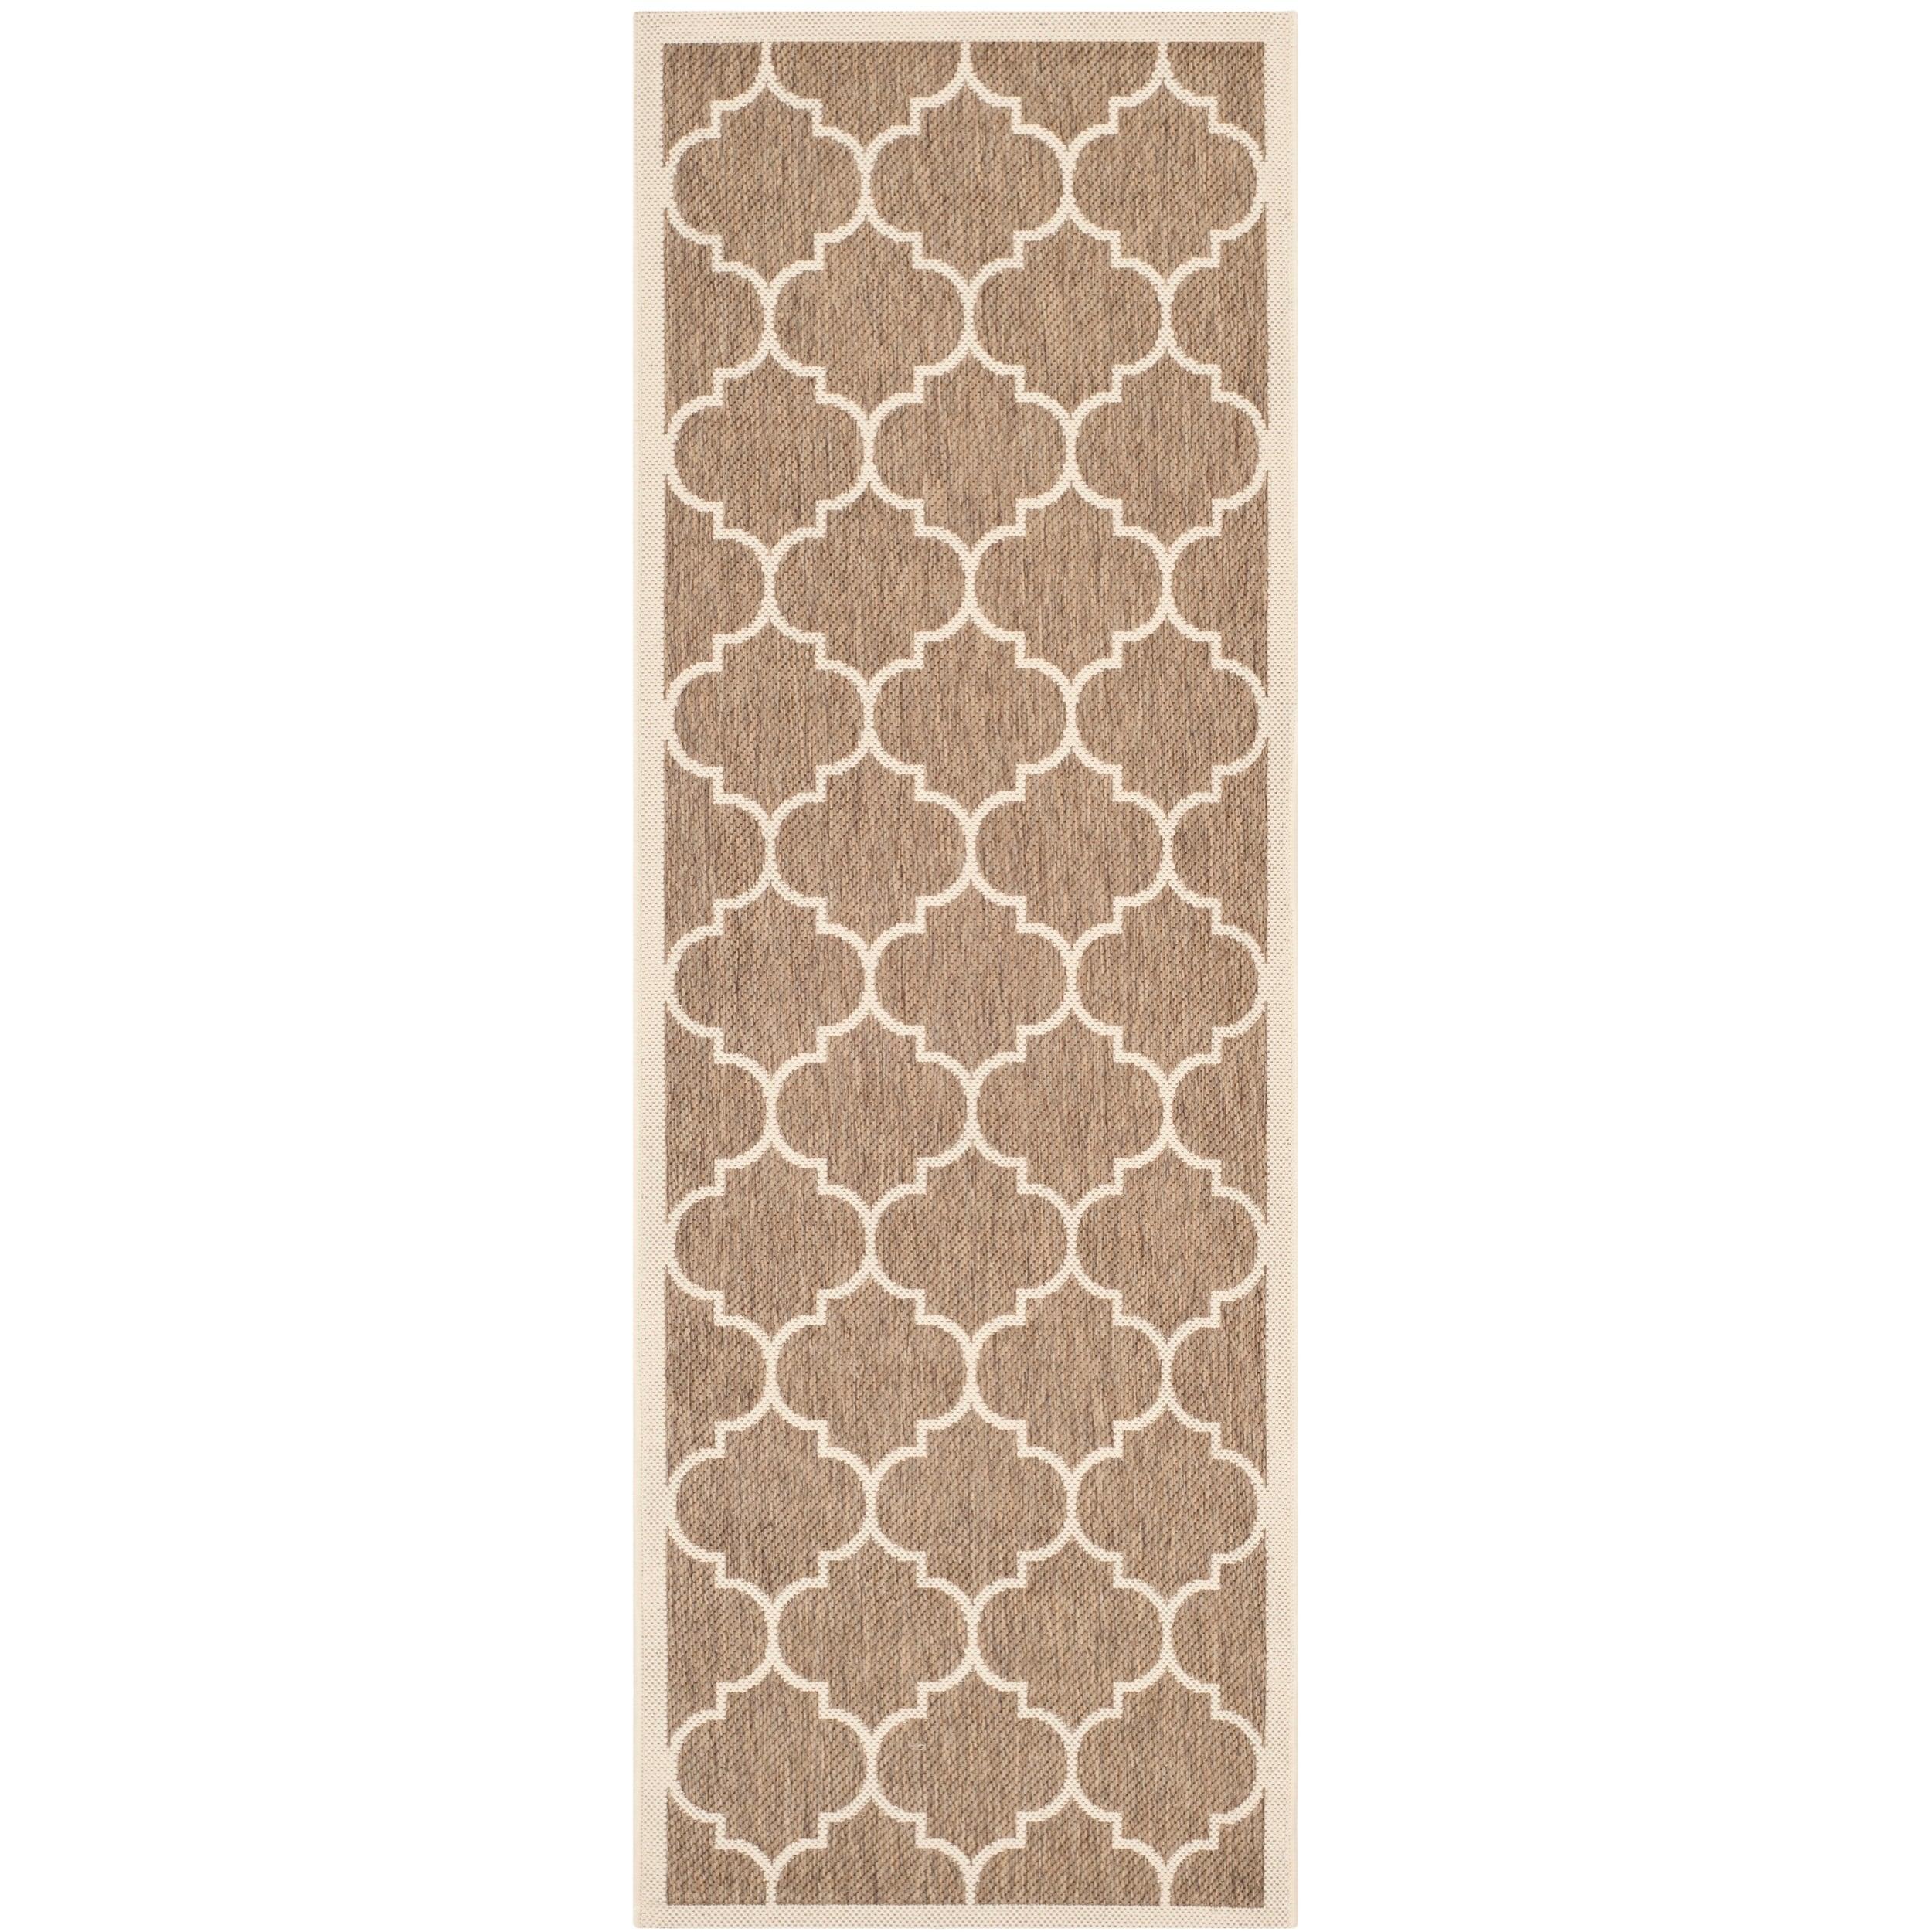 Safavieh Indoor/ Outdoor Courtyard Brown/ Bone Contemporary Rug (23 X 67)